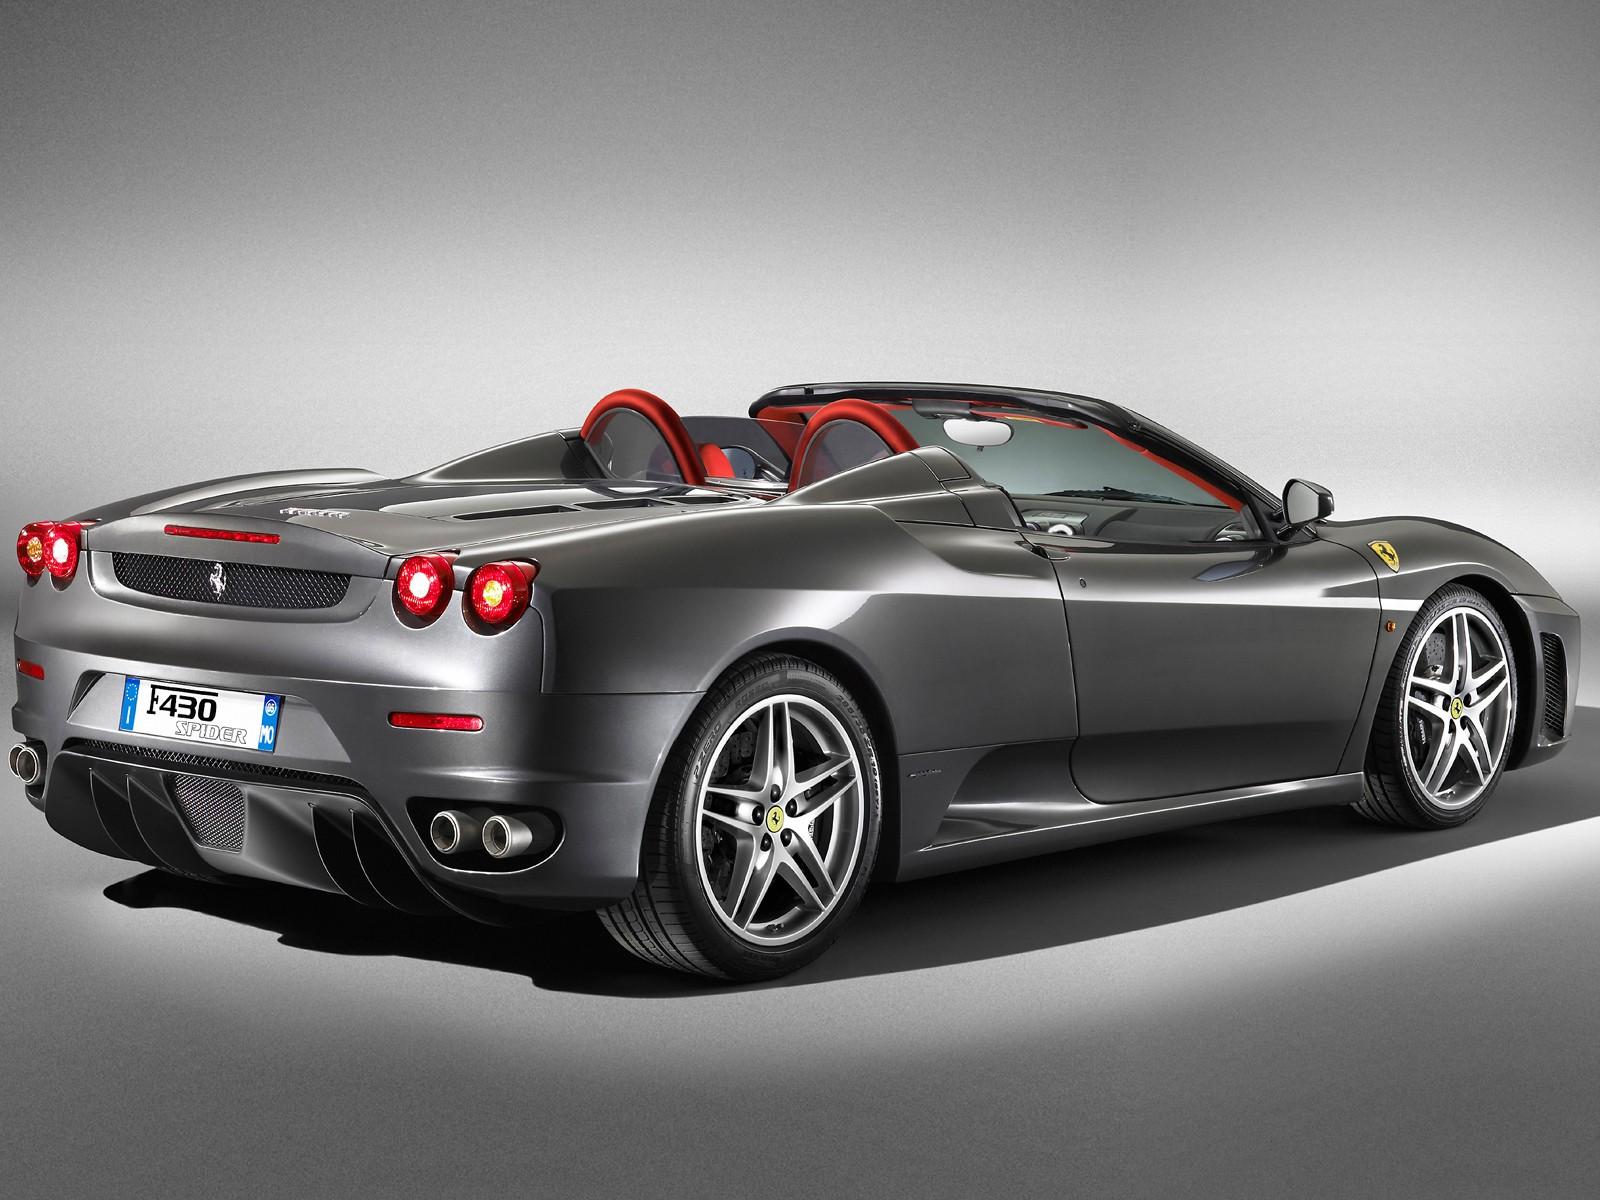 Image Result For Mac Wallpaper Ferrari  Spider Price